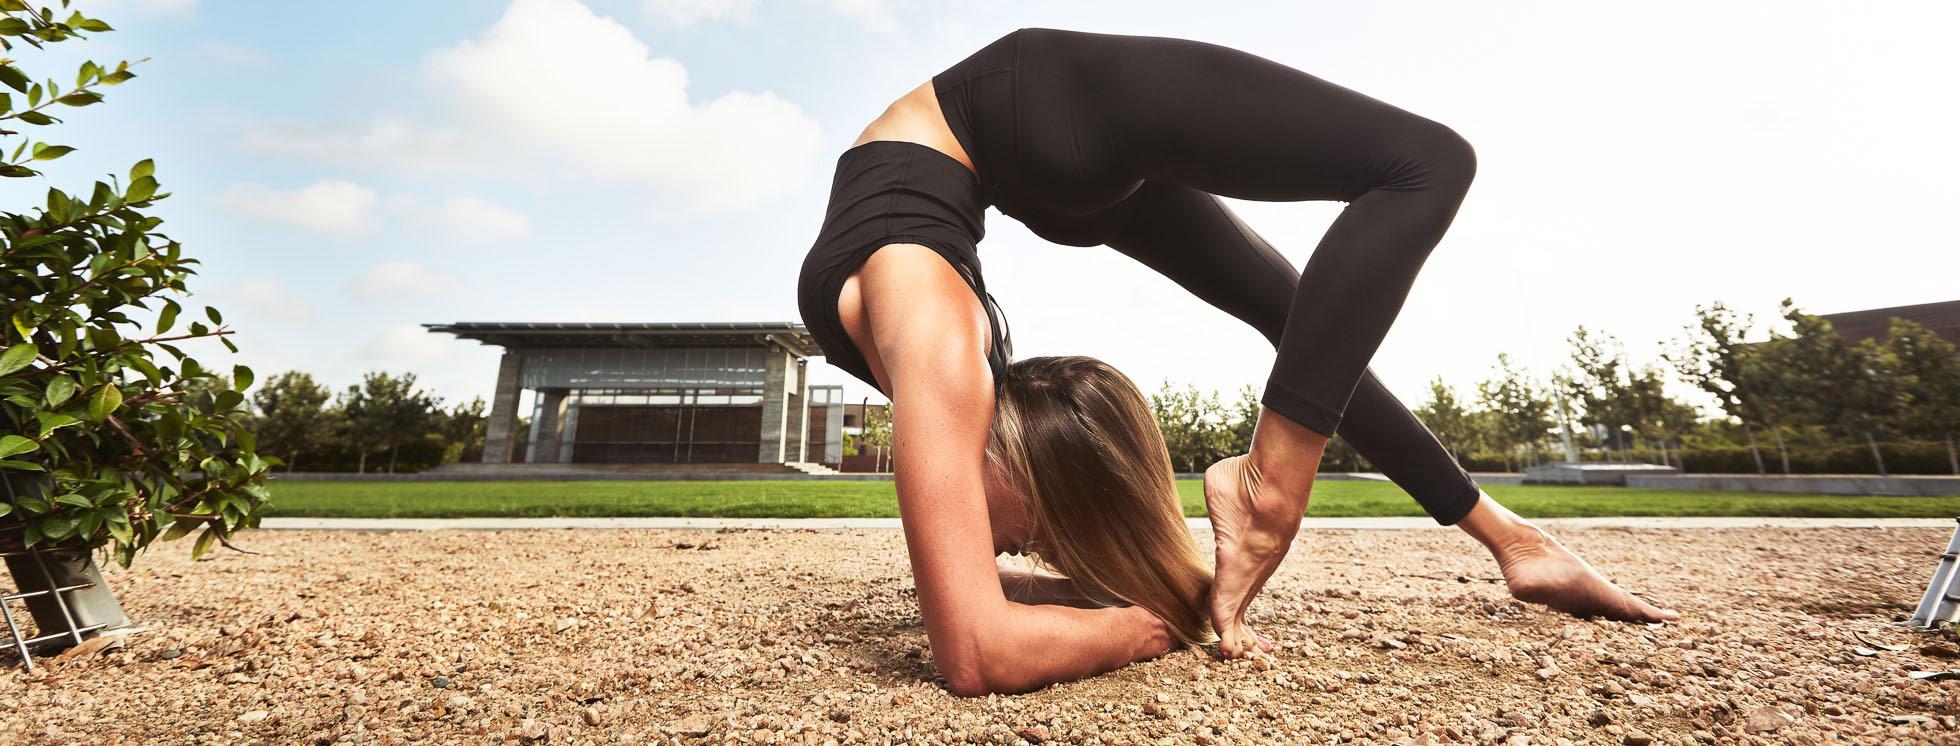 Behind the Scenes: Yoga Photoshoot for Lululemon